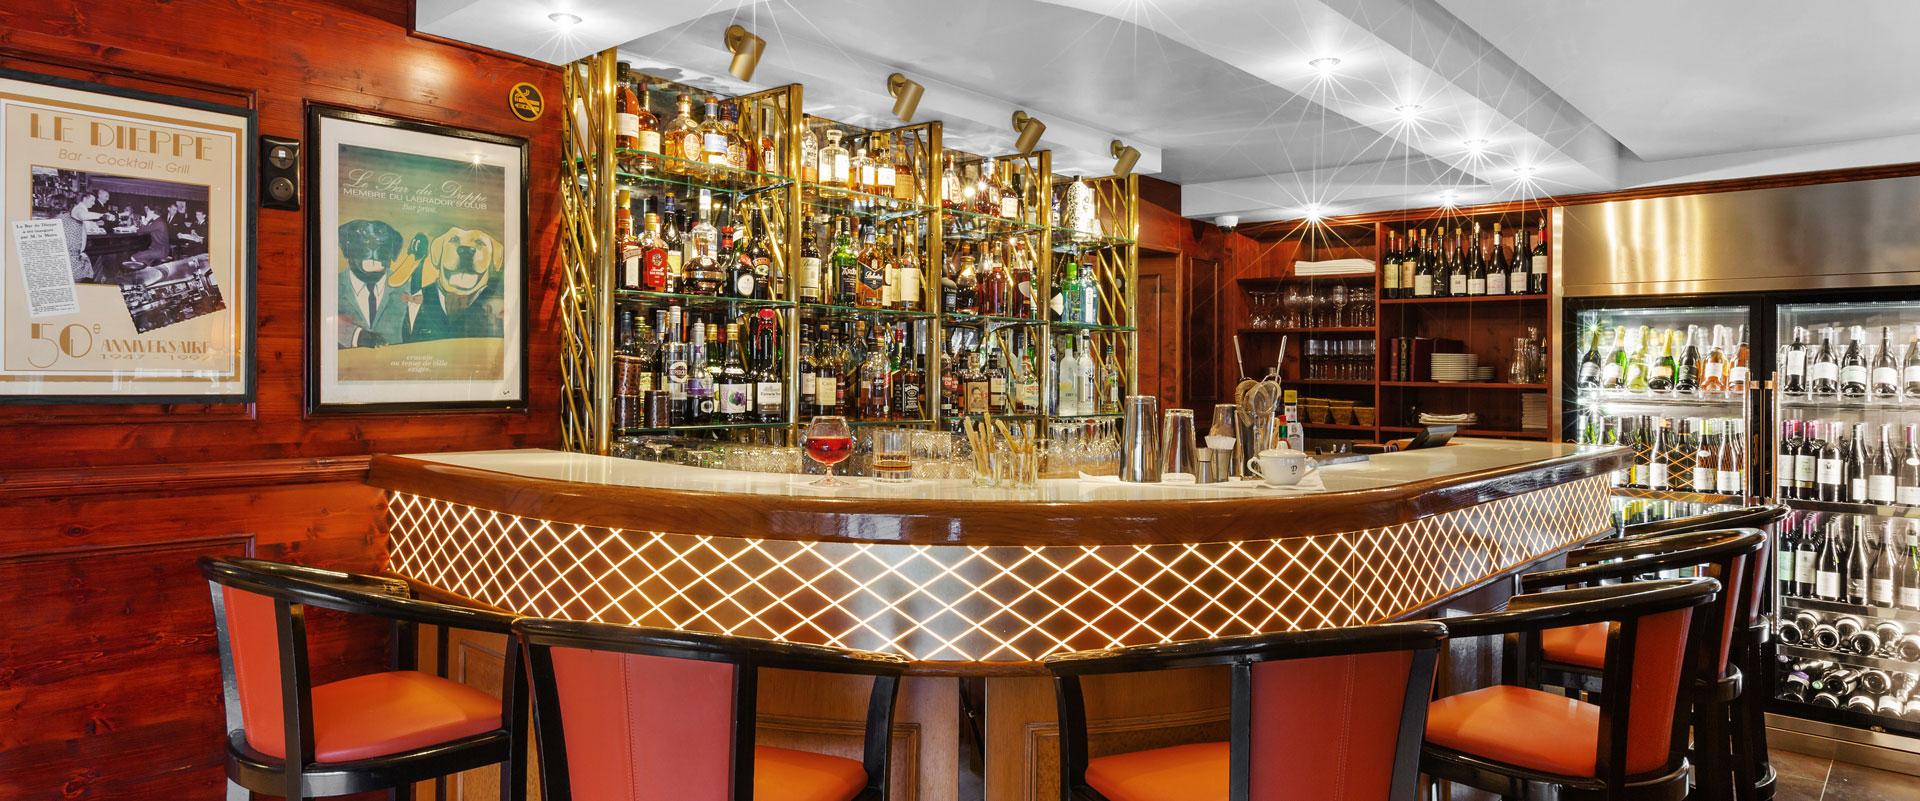 9-hotel-de-dieppe-1880-rouen-normandie-bar-grill-1920×801